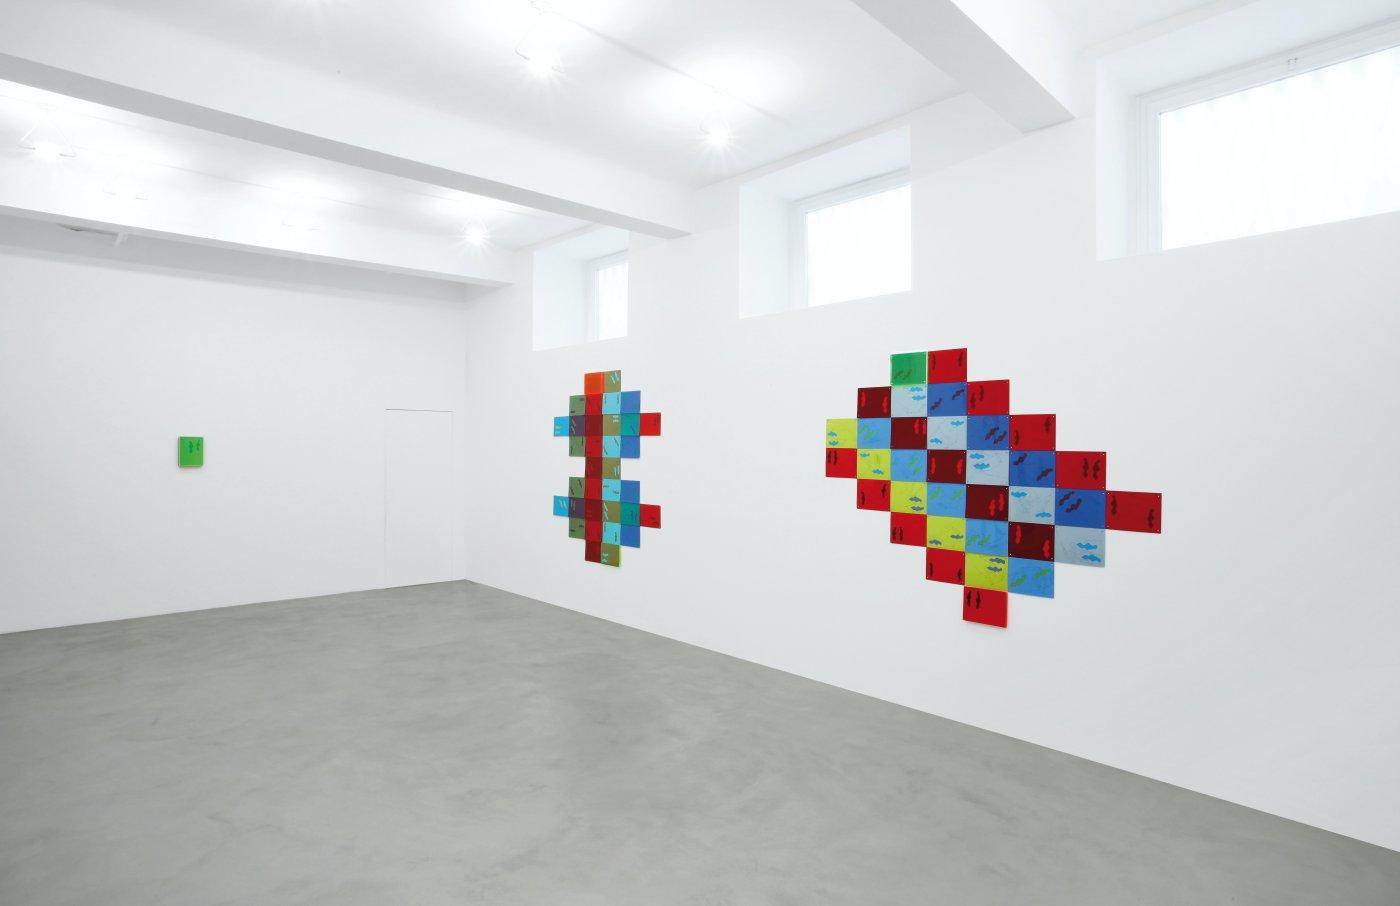 A Arte Invernizzi Francesco Candeloro 3